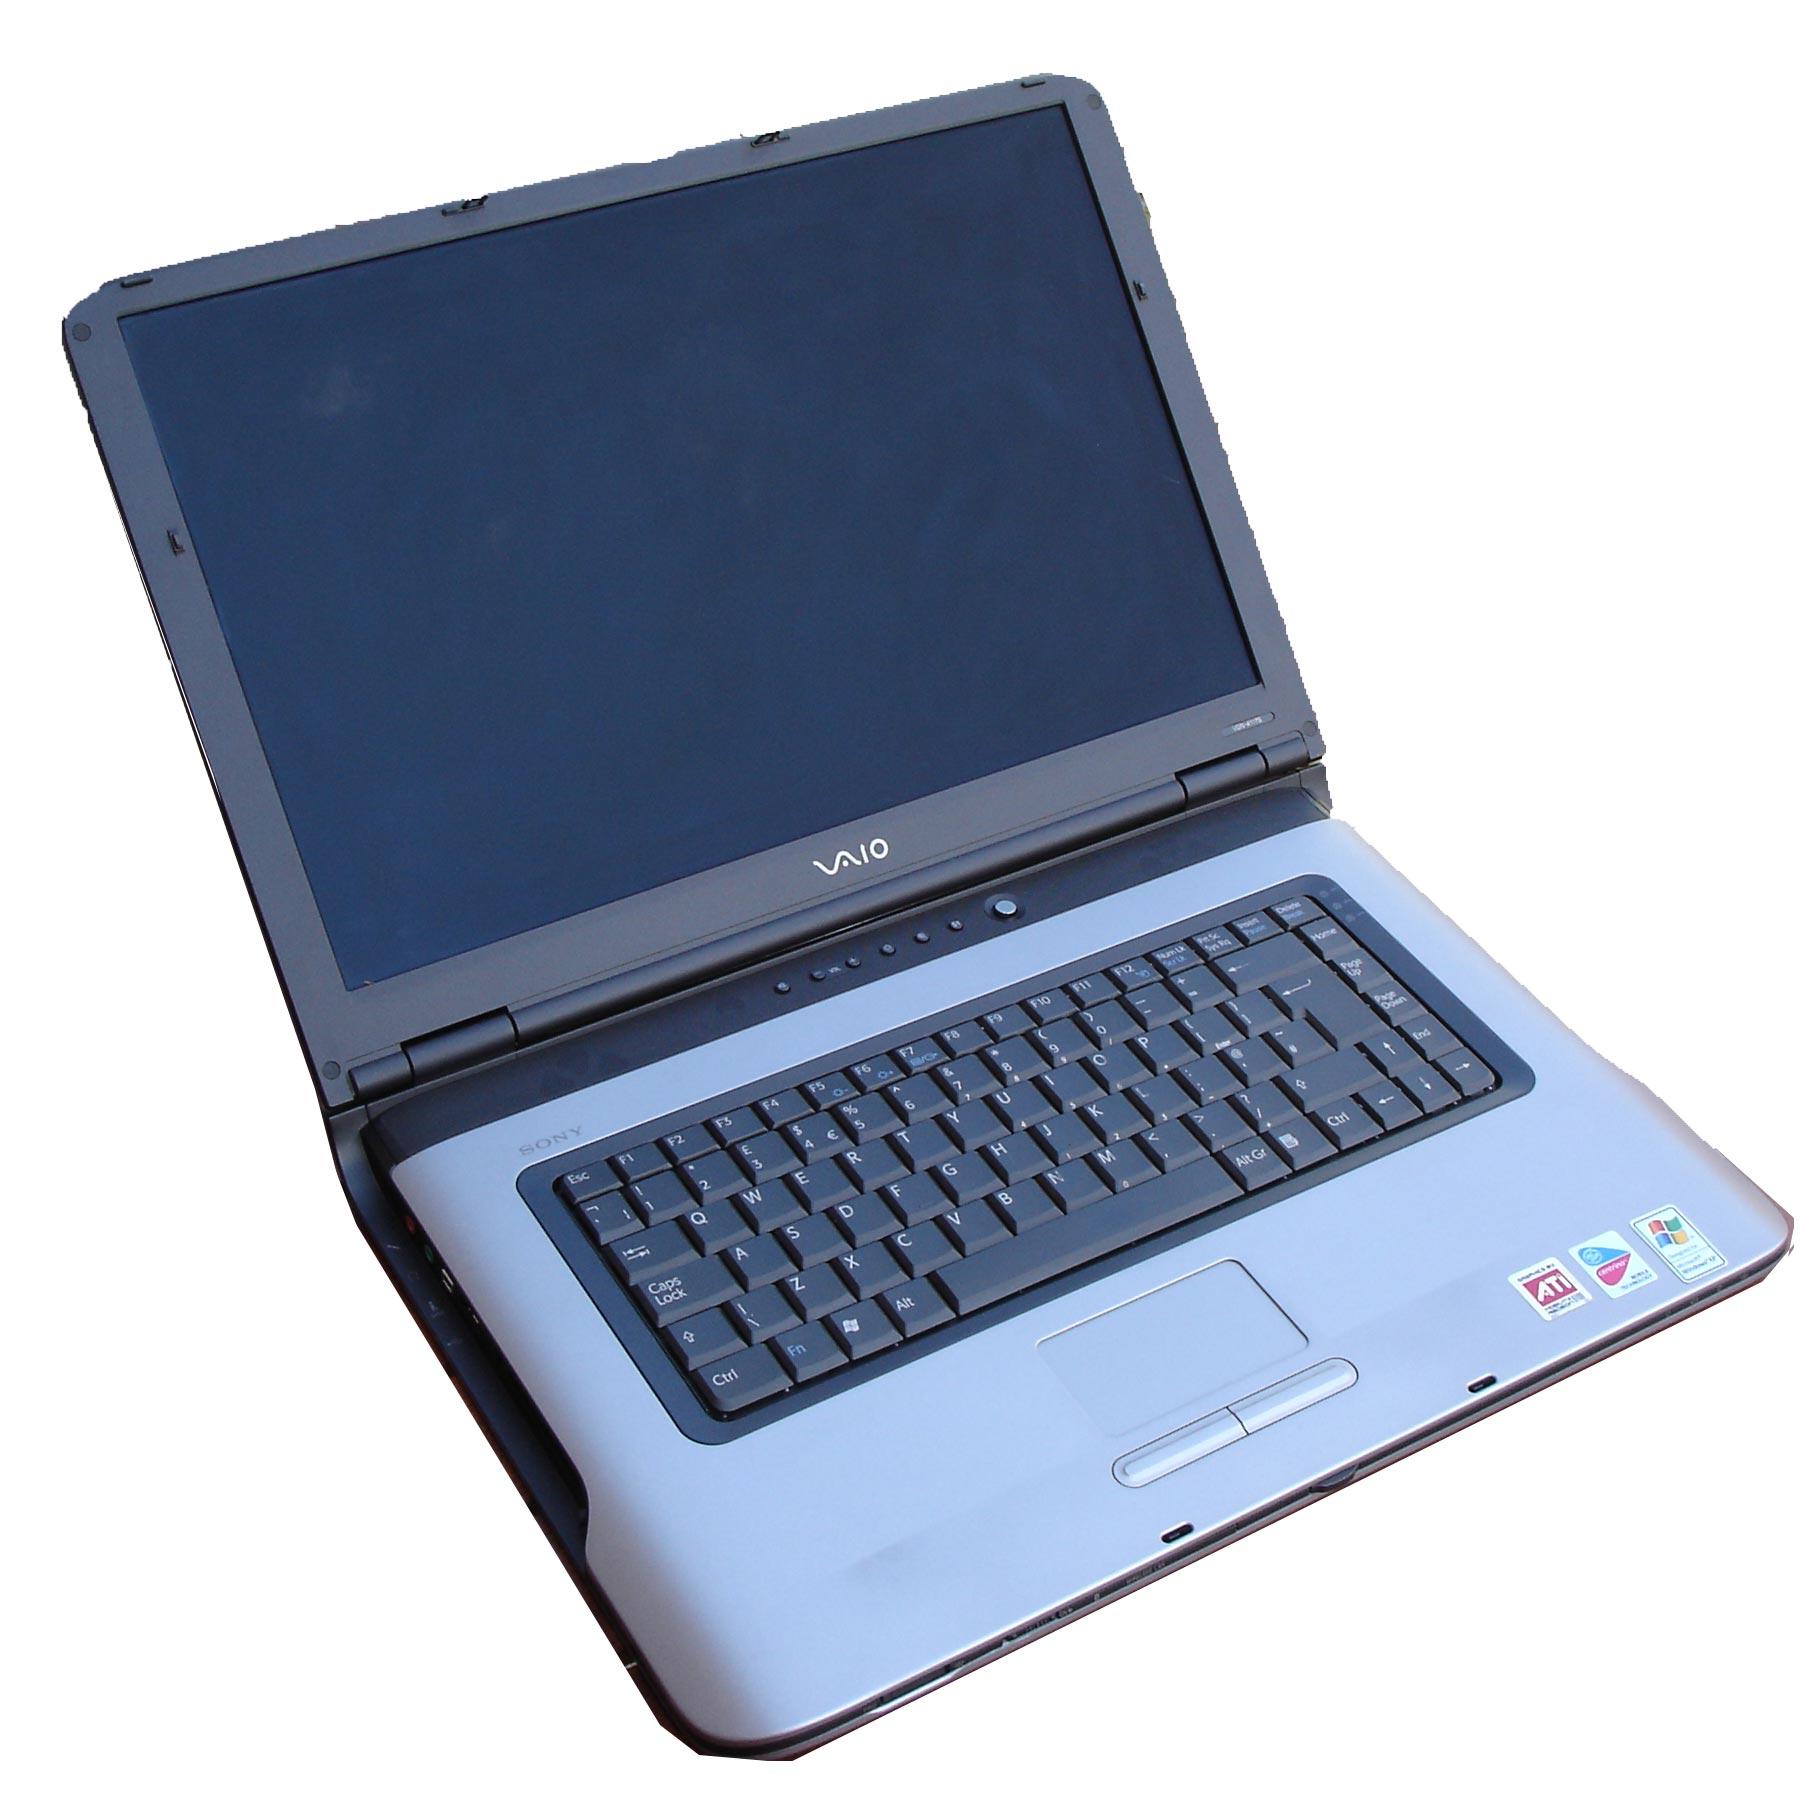 free call 0800 0588 440 sony vaio laptop